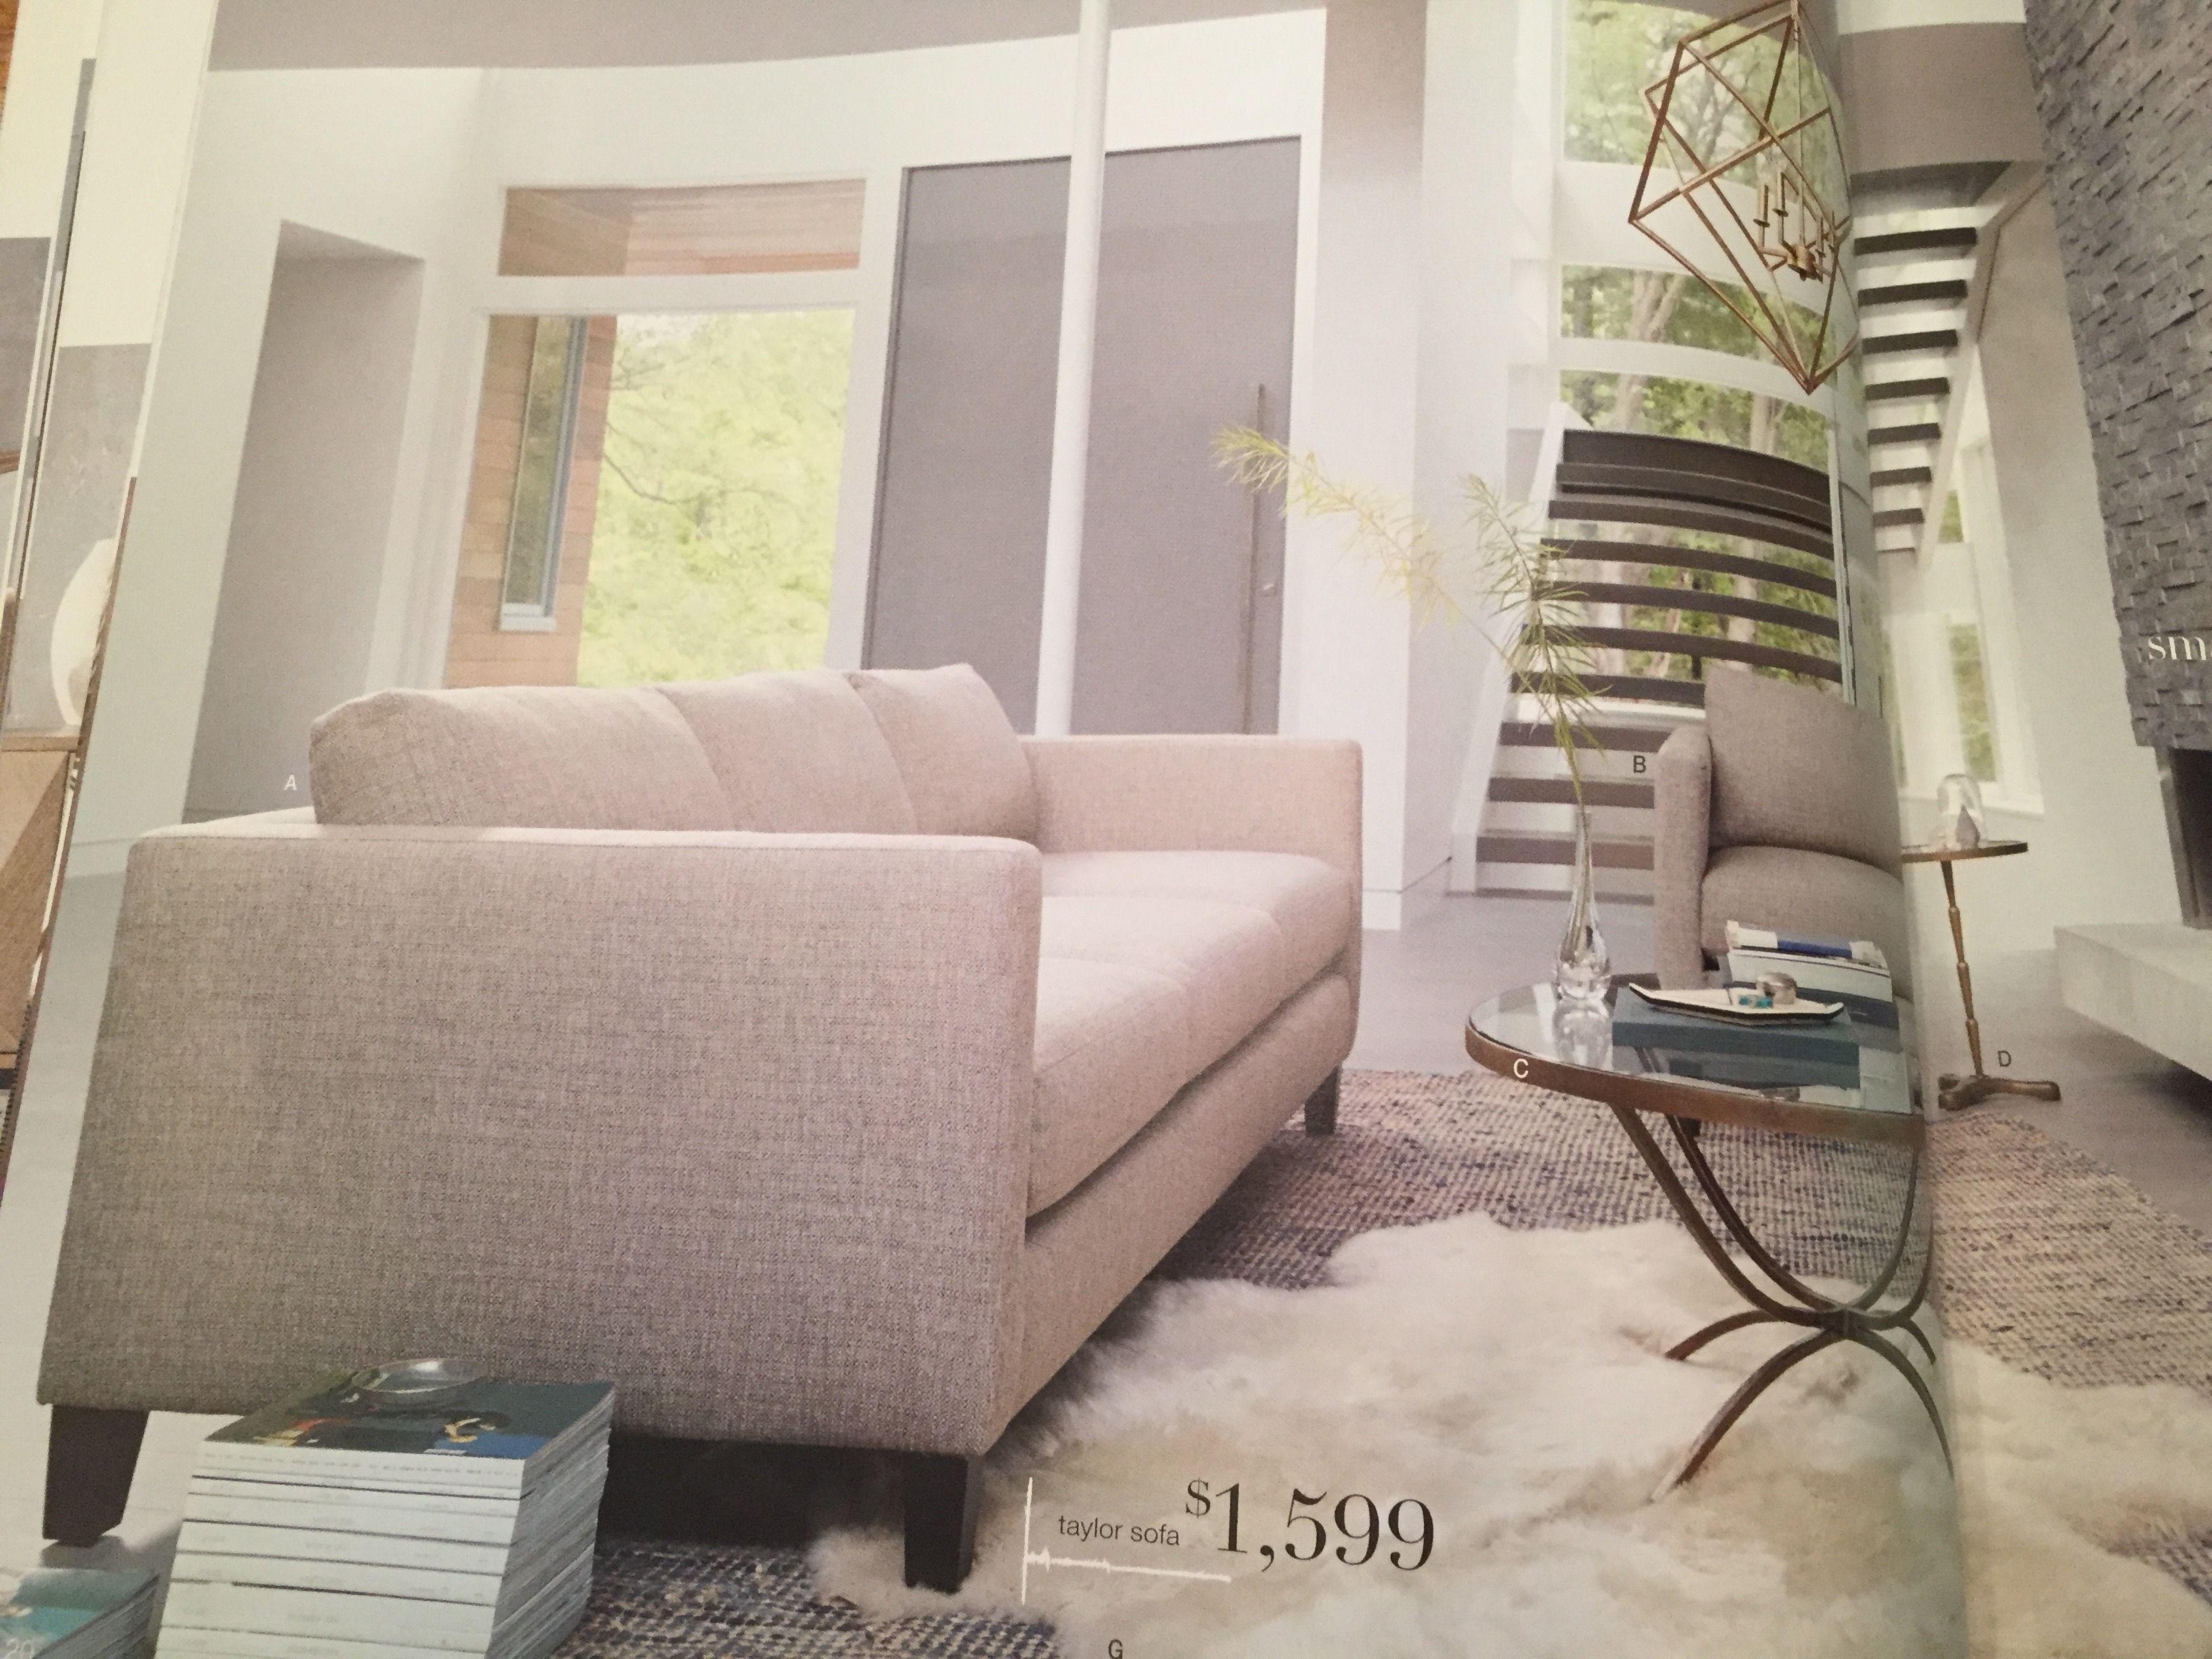 Pin by carol on Furniture